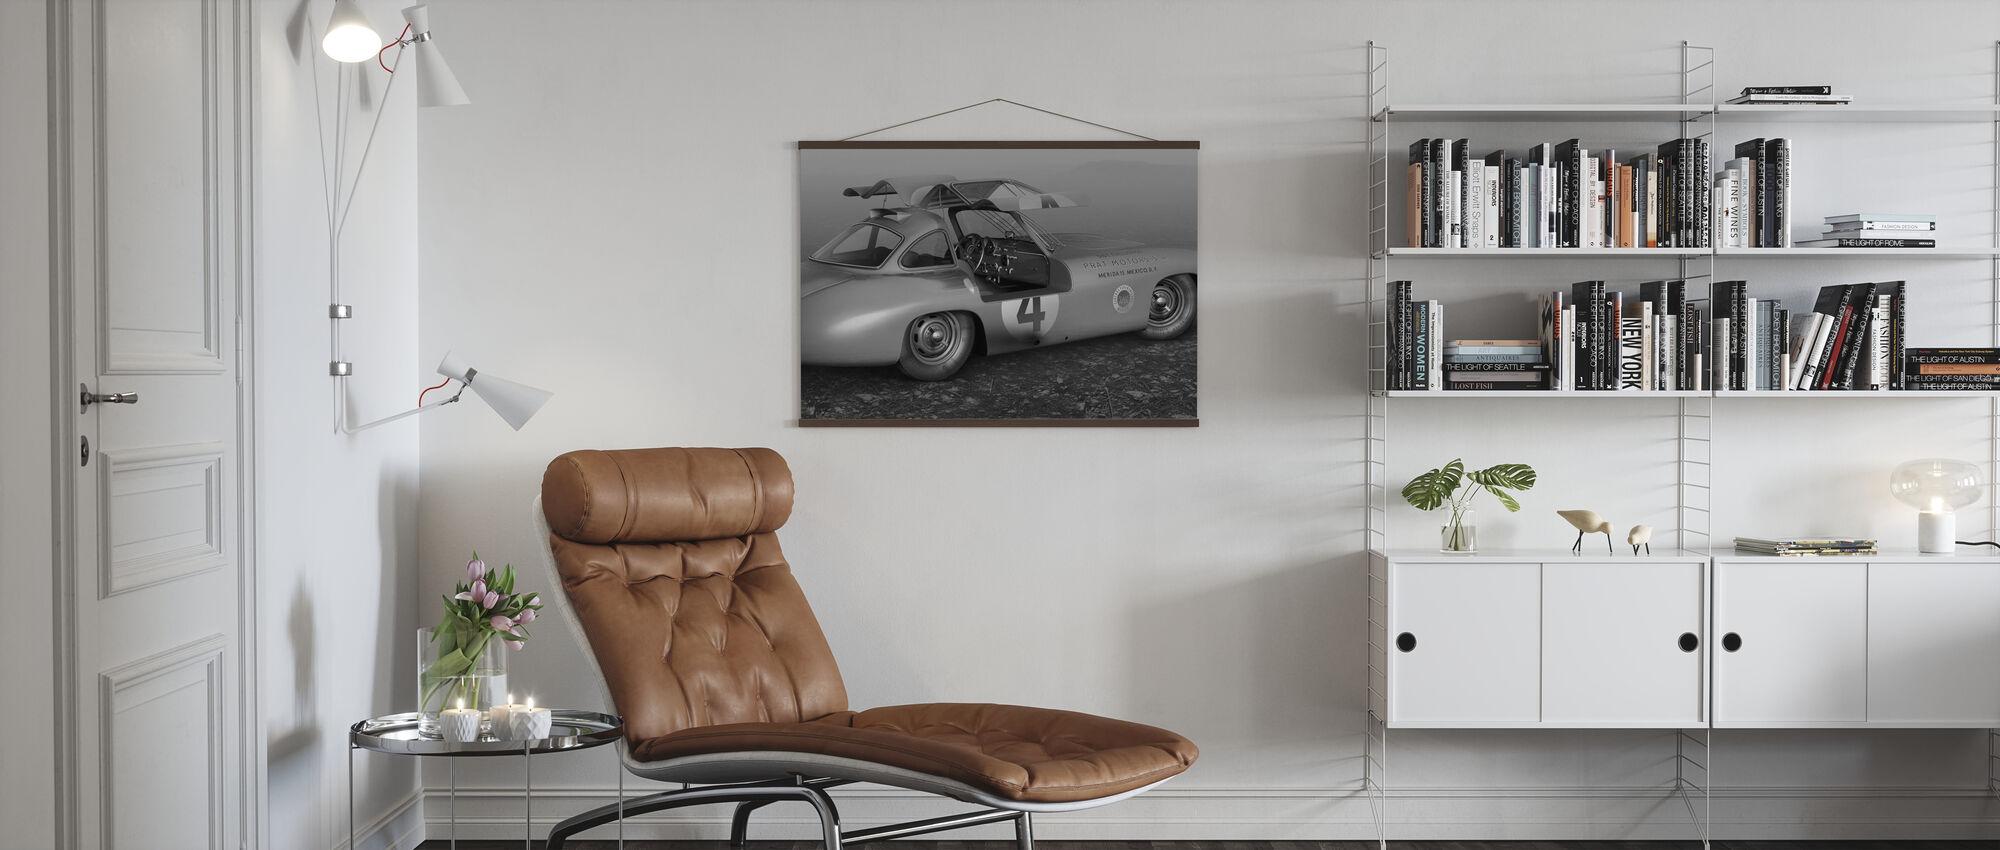 C Panamericana BW - Poster - Living Room